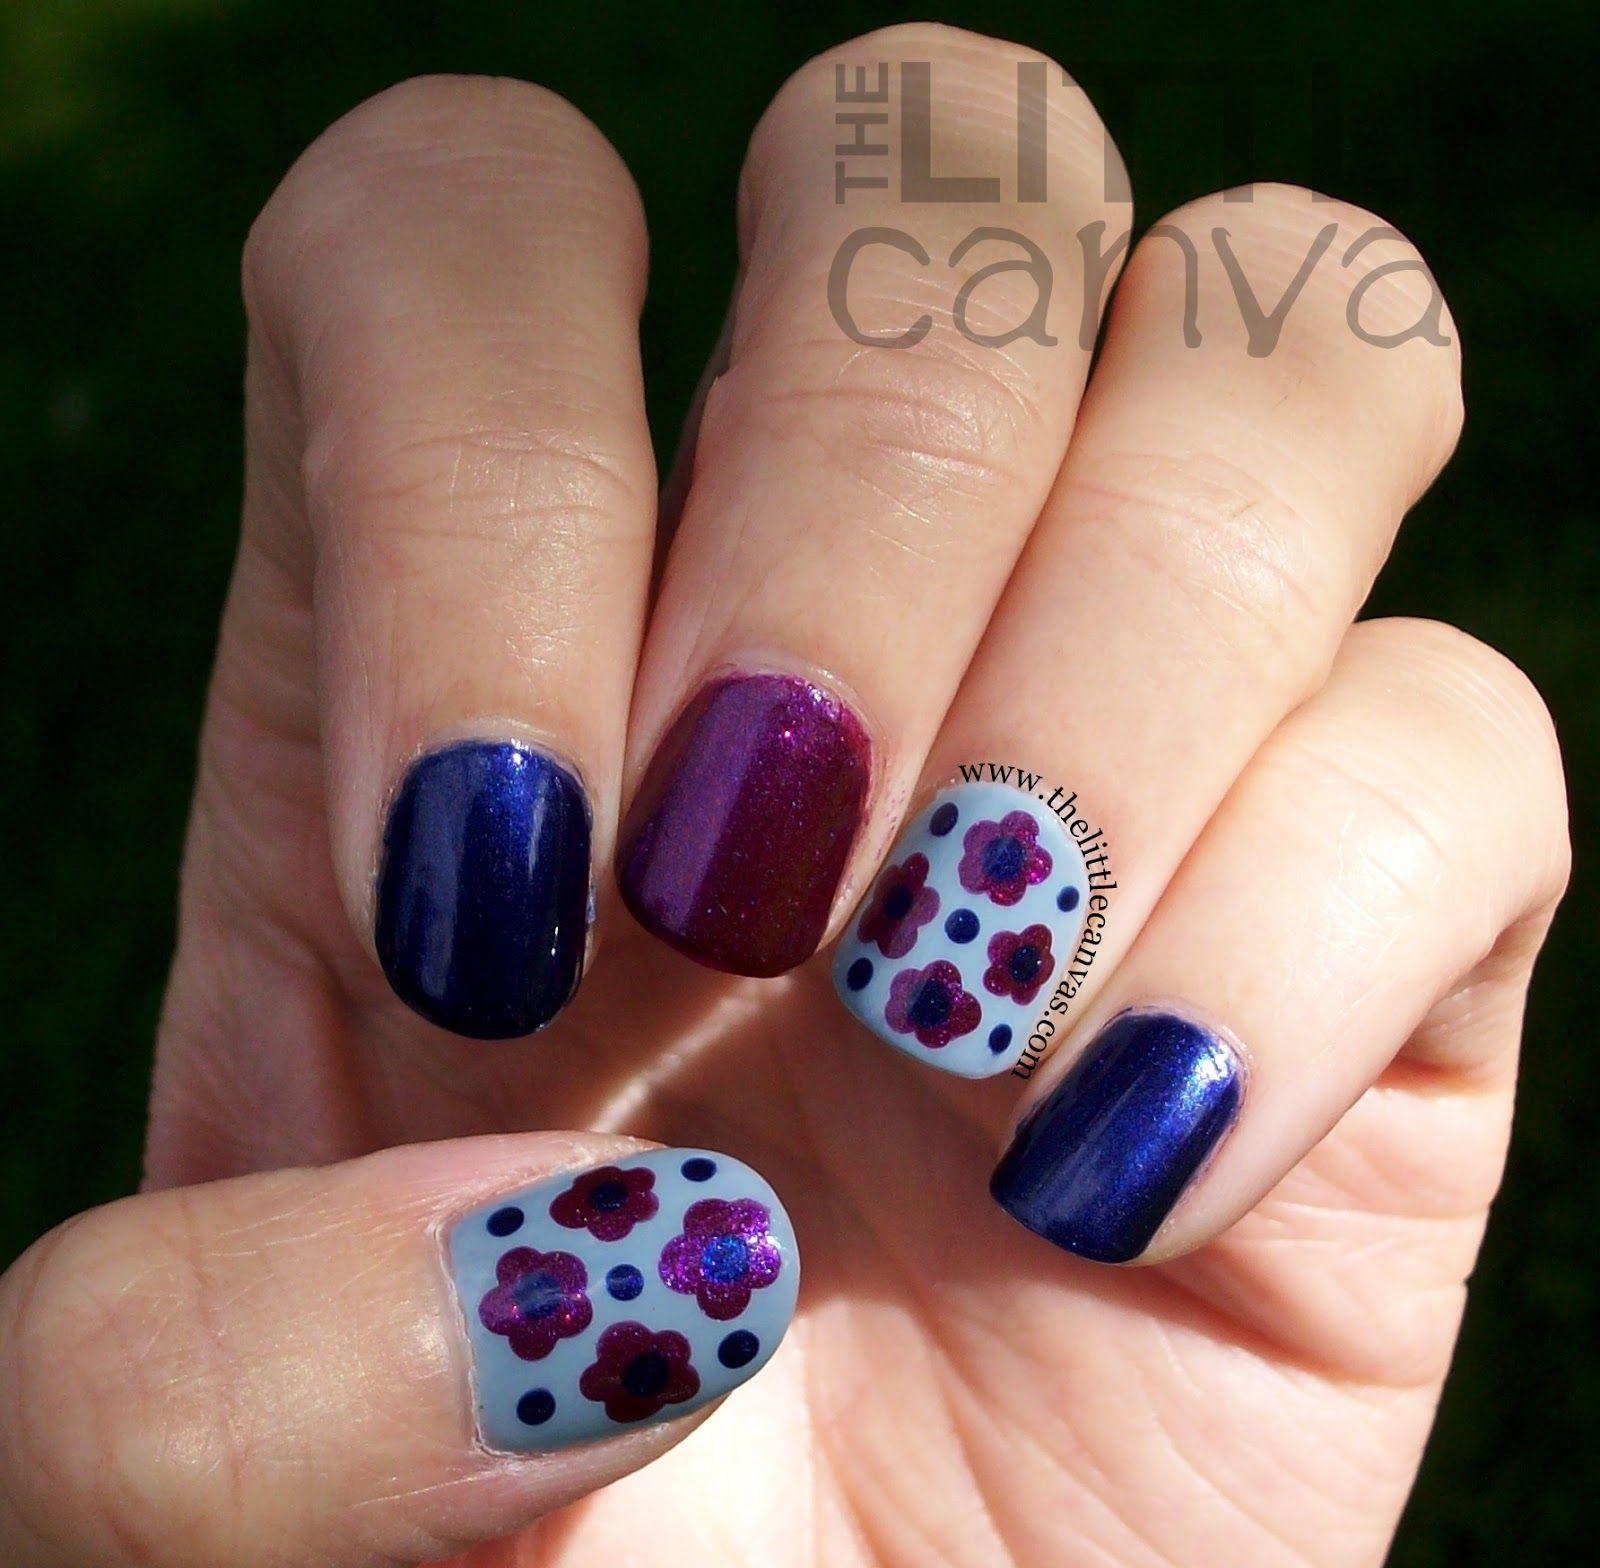 The Little Canvas: The Little Canvas: Zoya Mason & Neve Dot Flowers